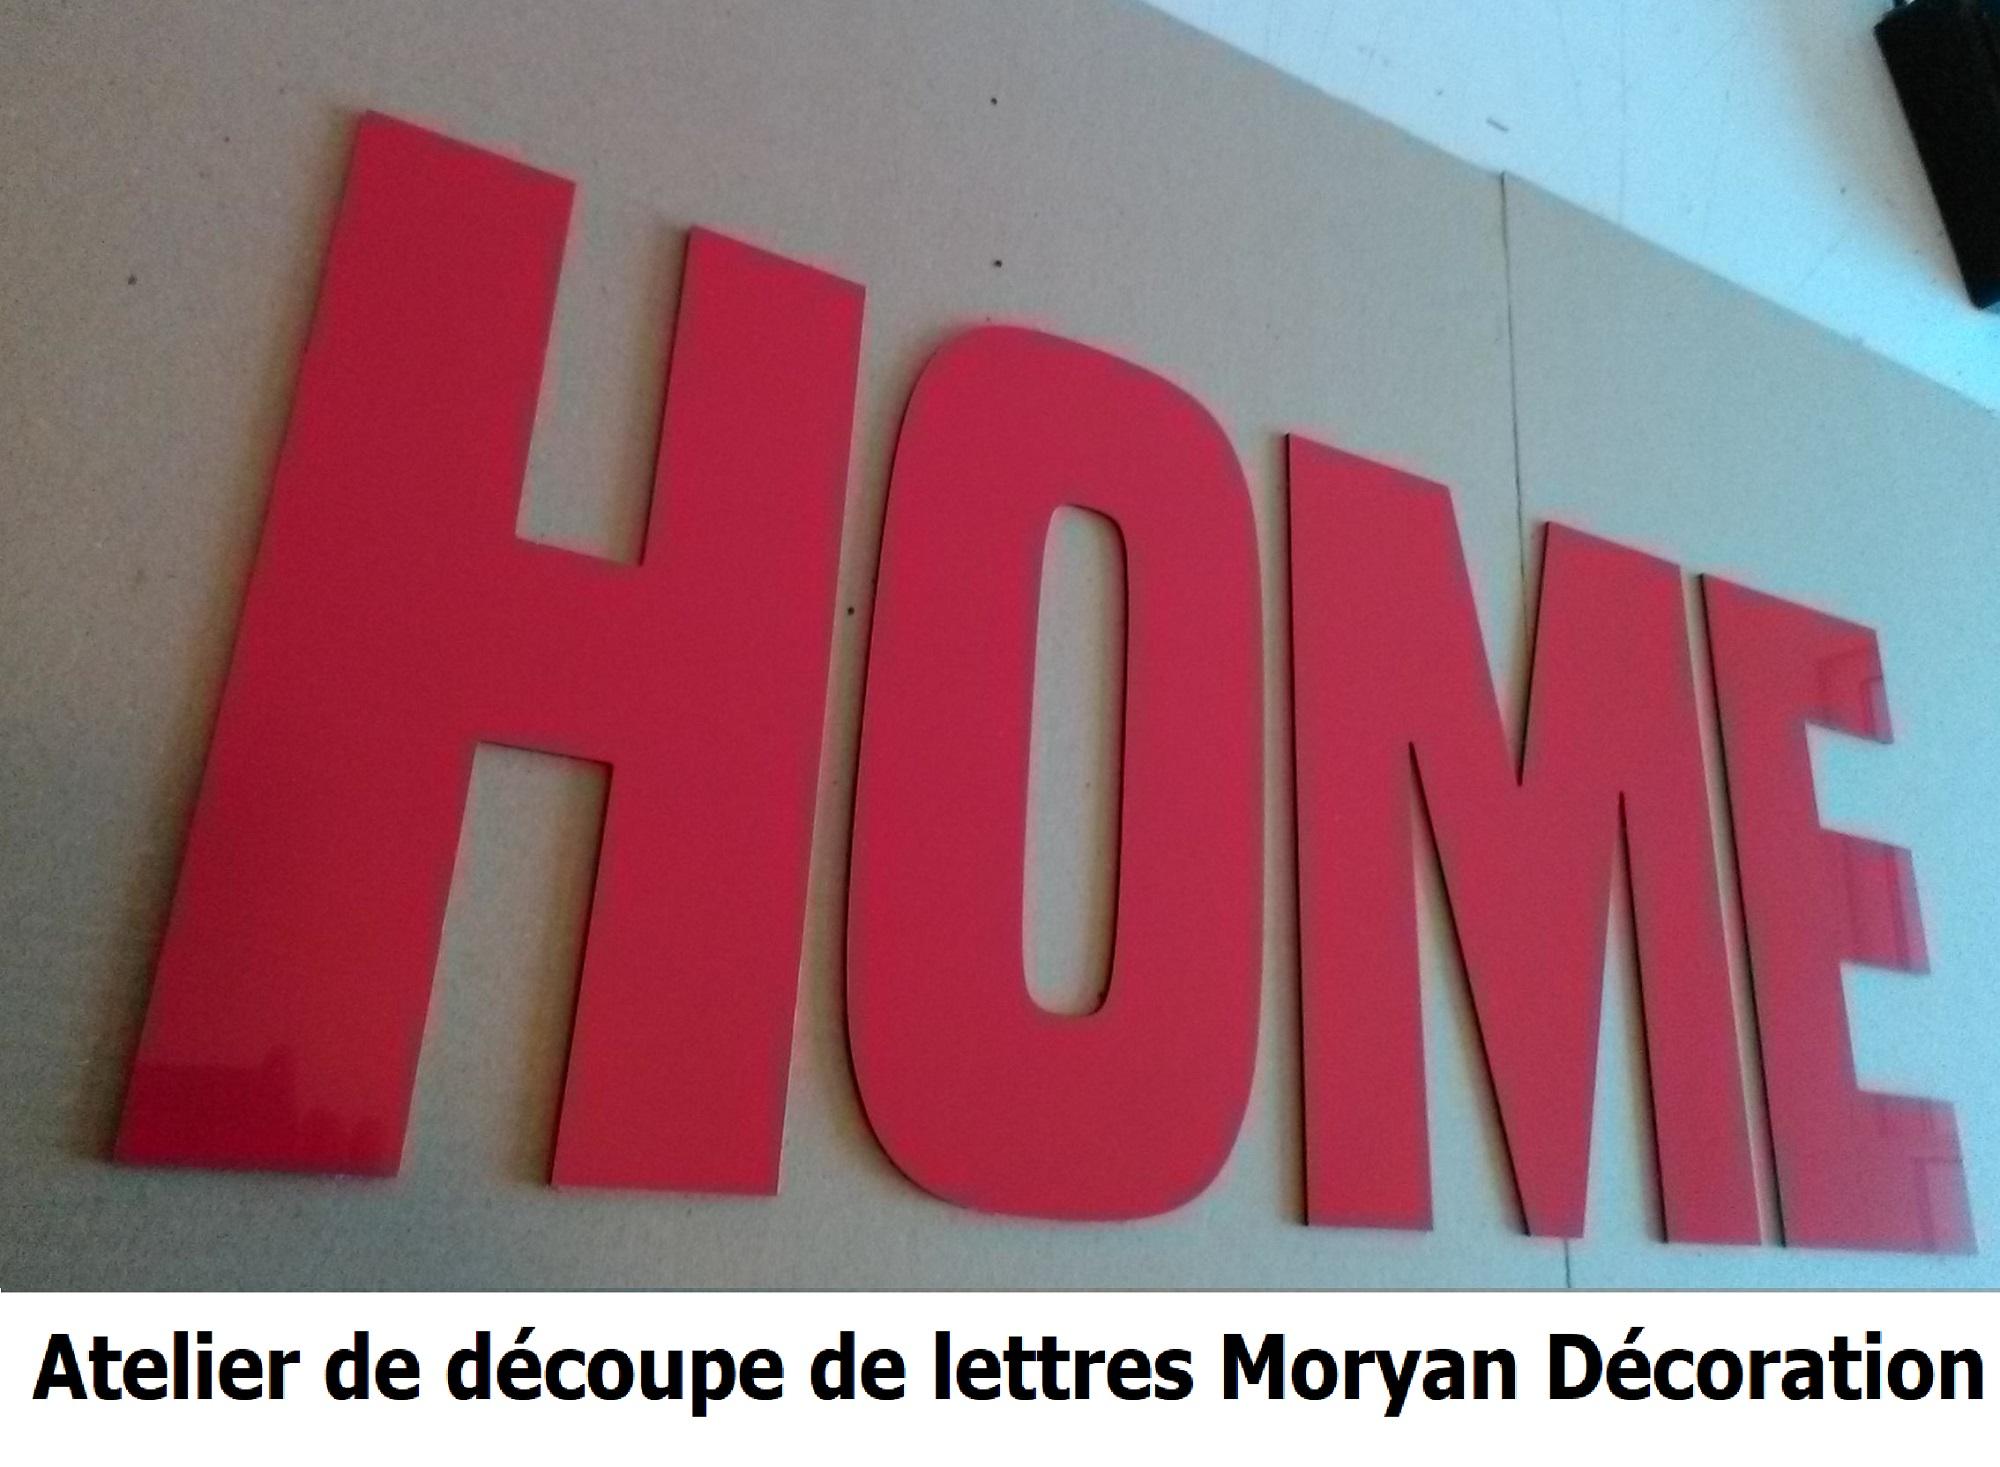 Lettre deco HOME 4